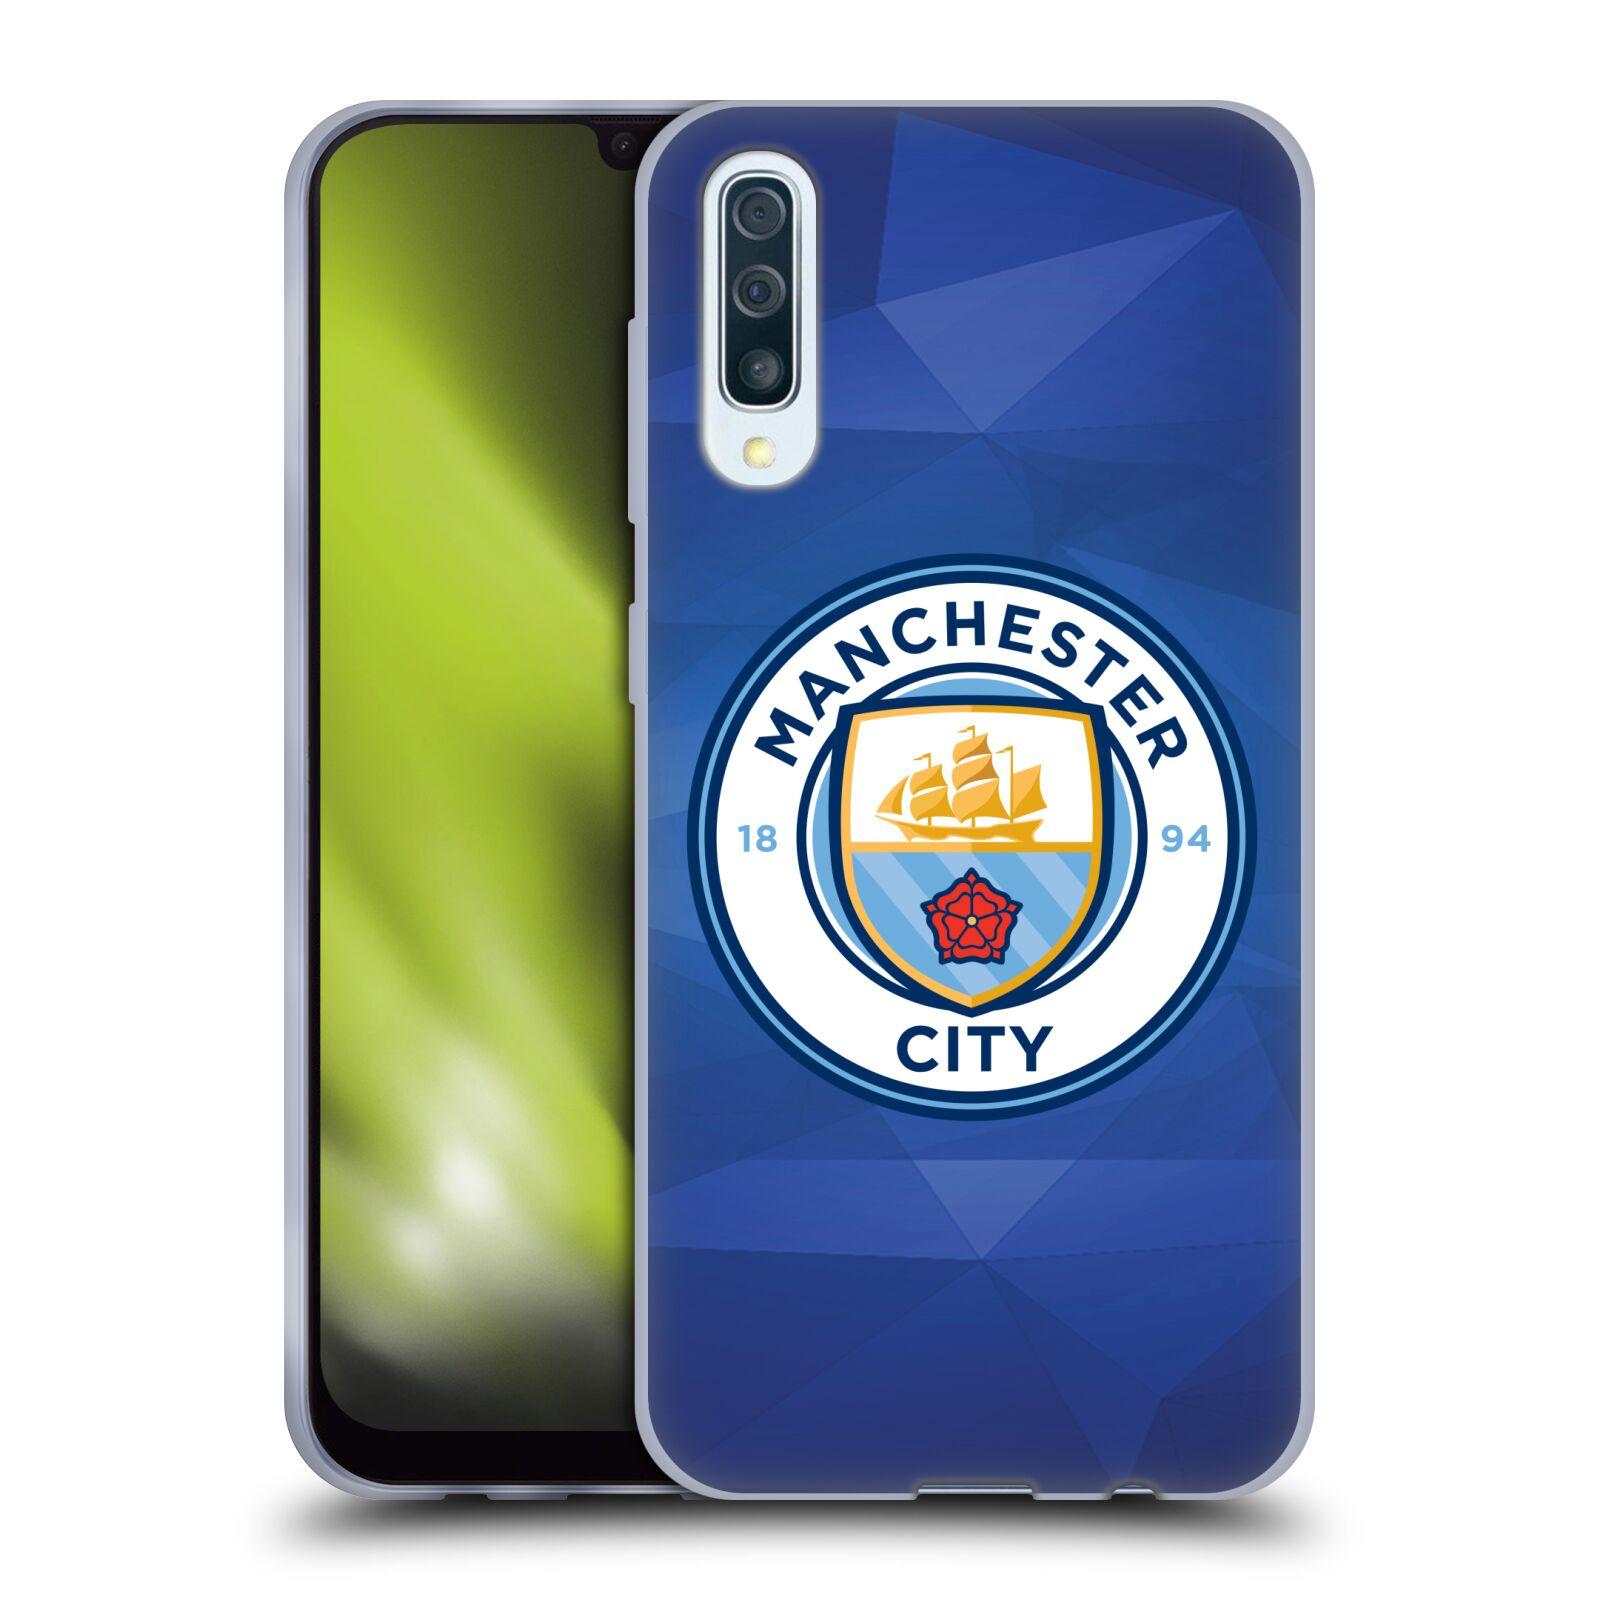 Silikonové pouzdro na mobil Samsung Galaxy A50 / A30s - Head Case - Manchester City FC - Modré nové logo